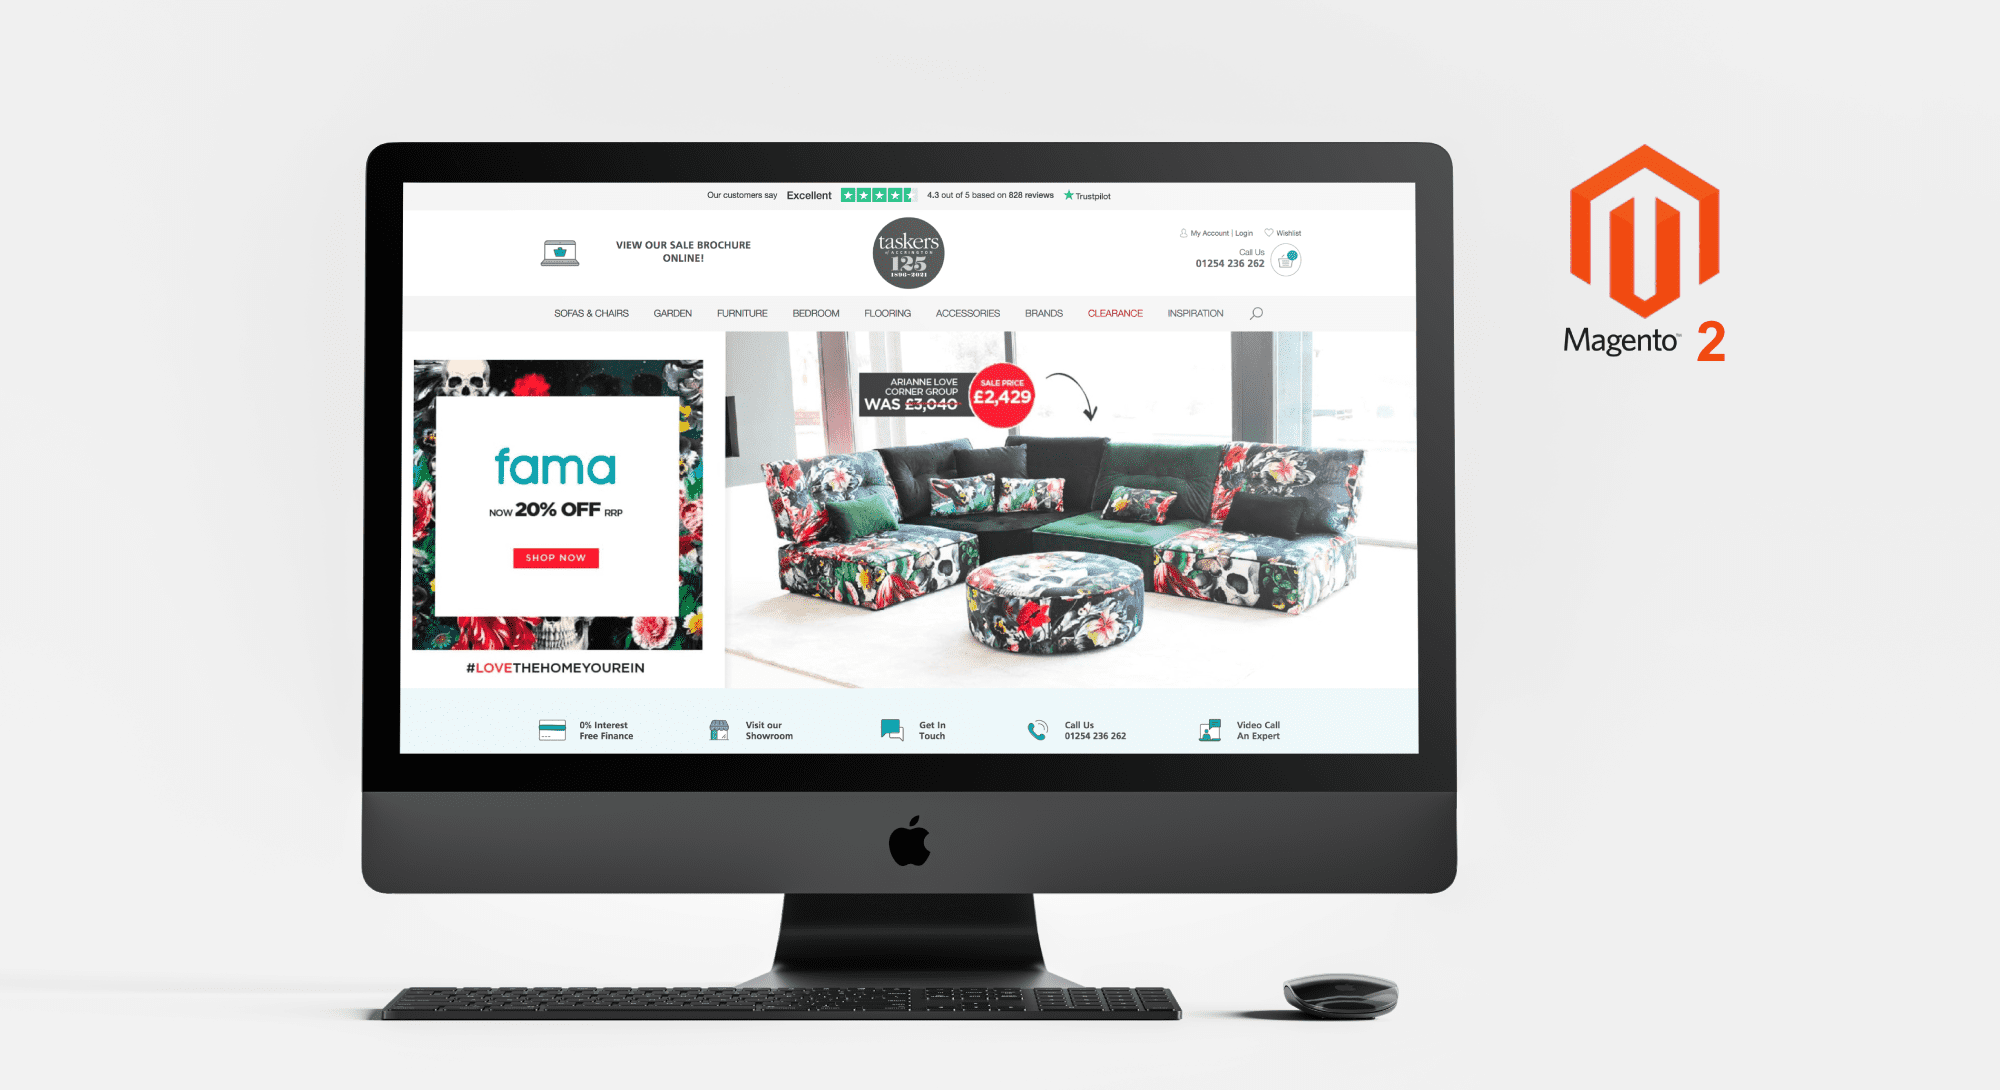 Taskers of Accrington - Magento 2 eCommerce Platform